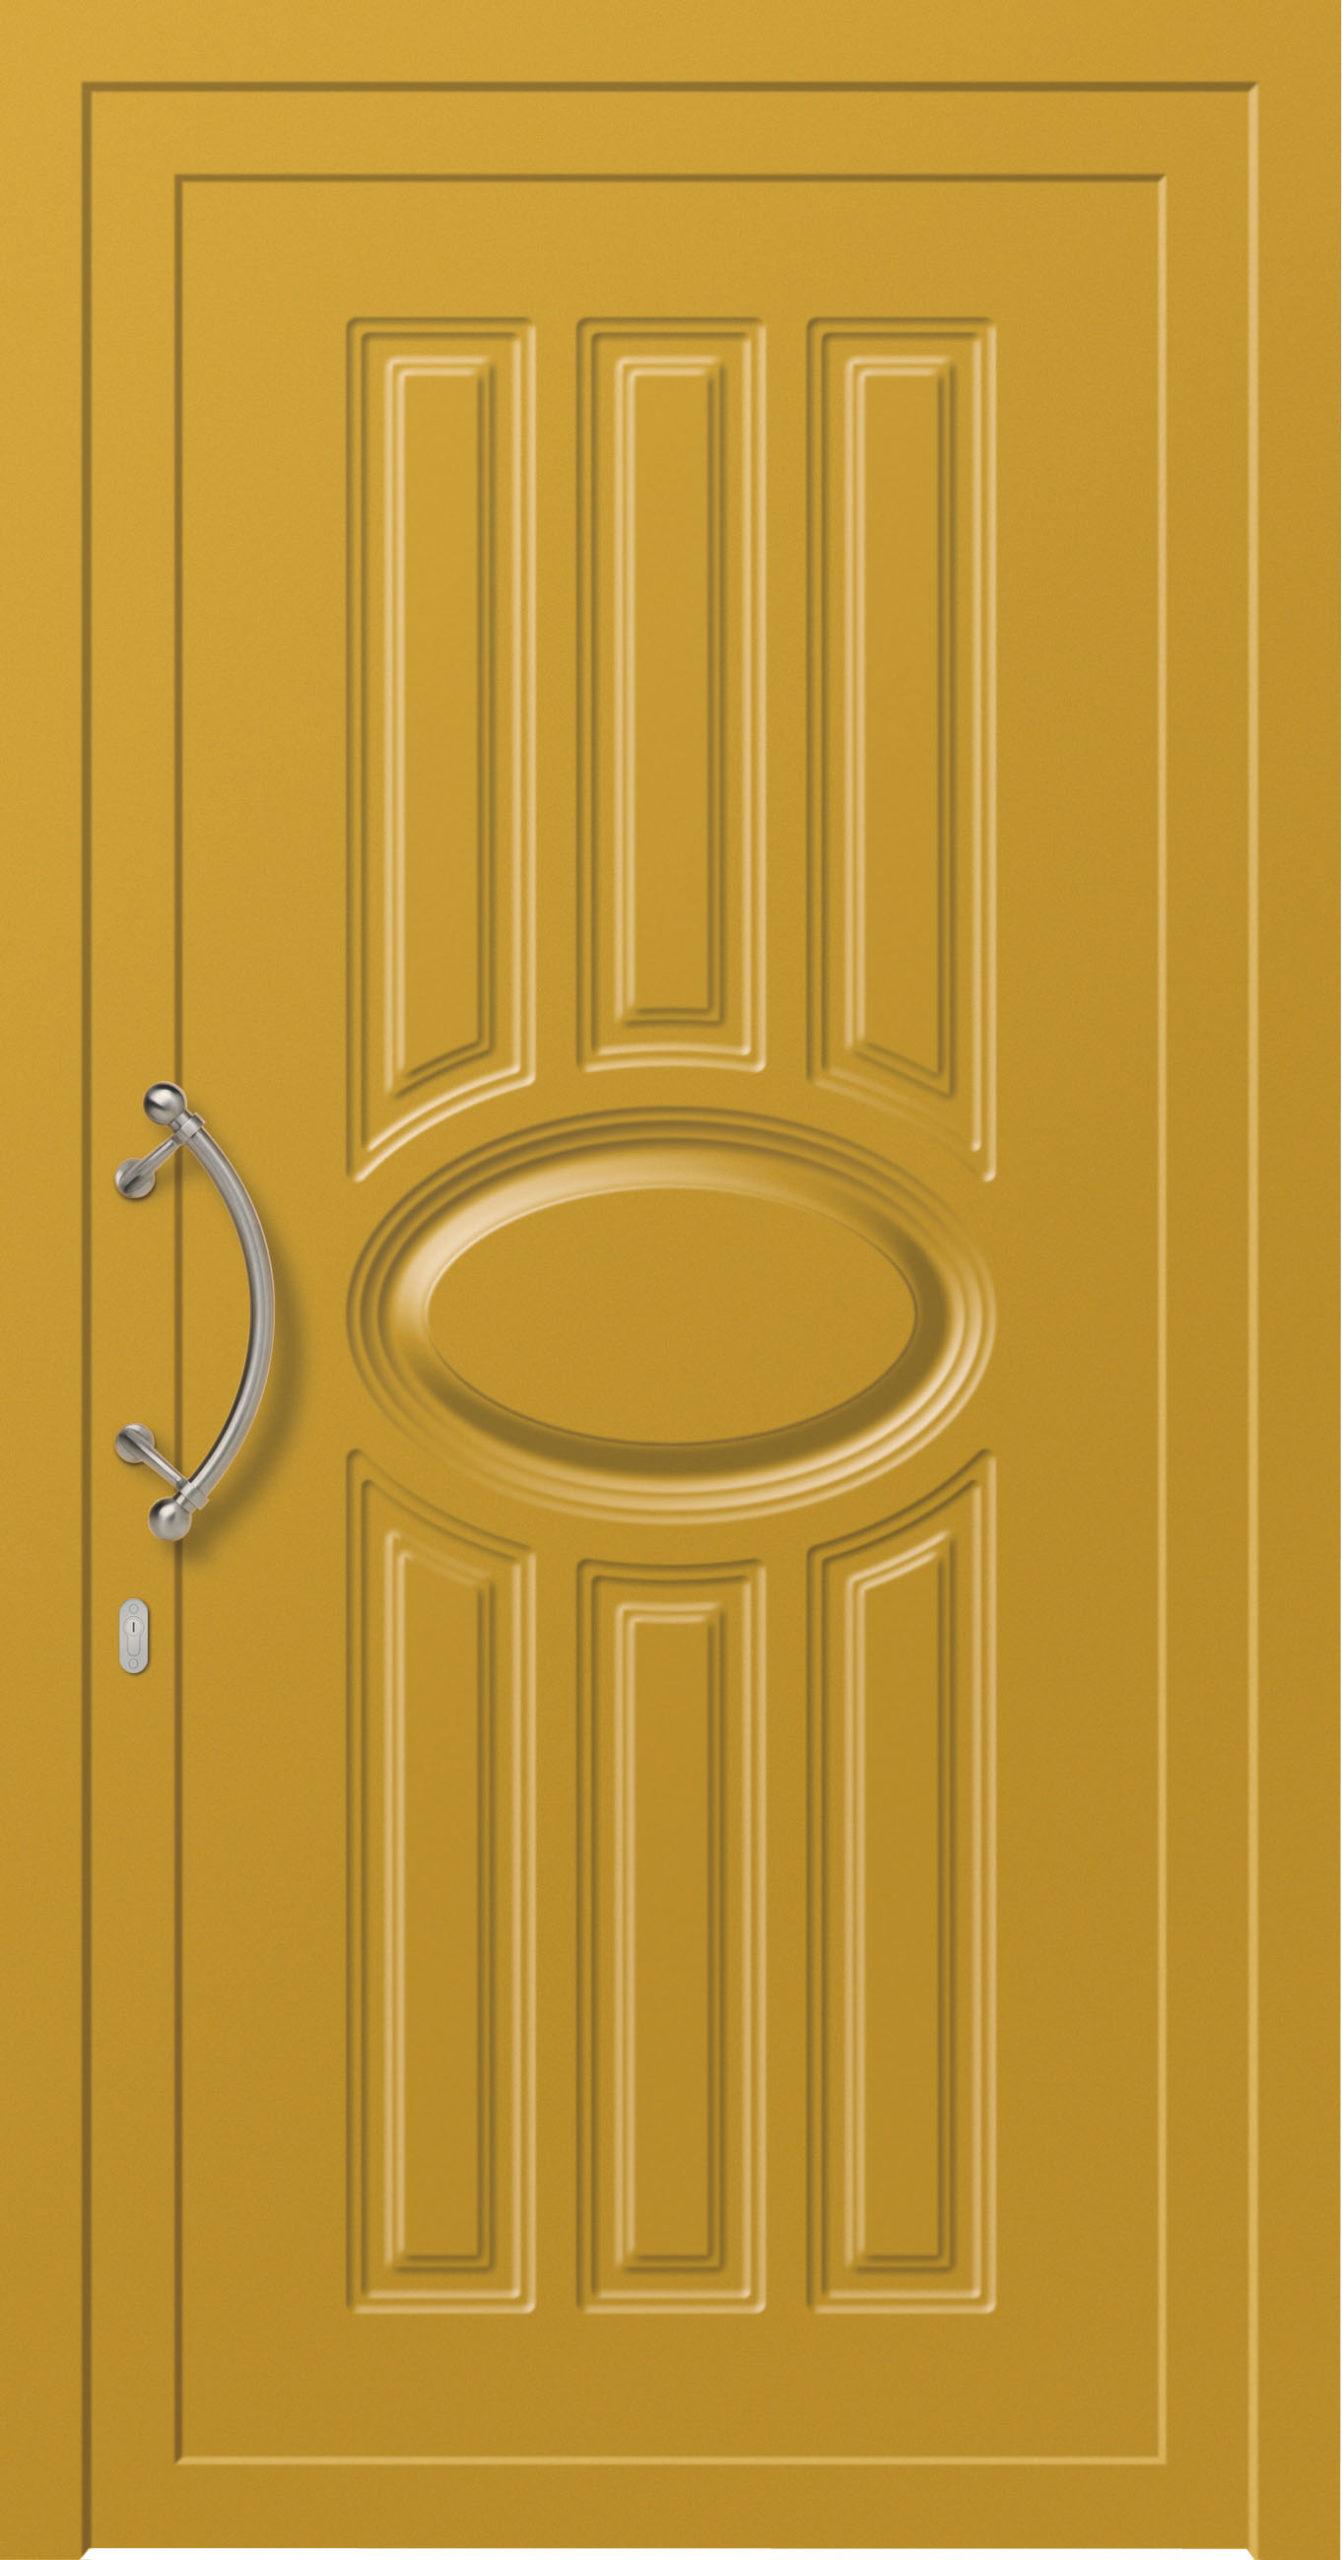 Entry Doors Linea Classica 45